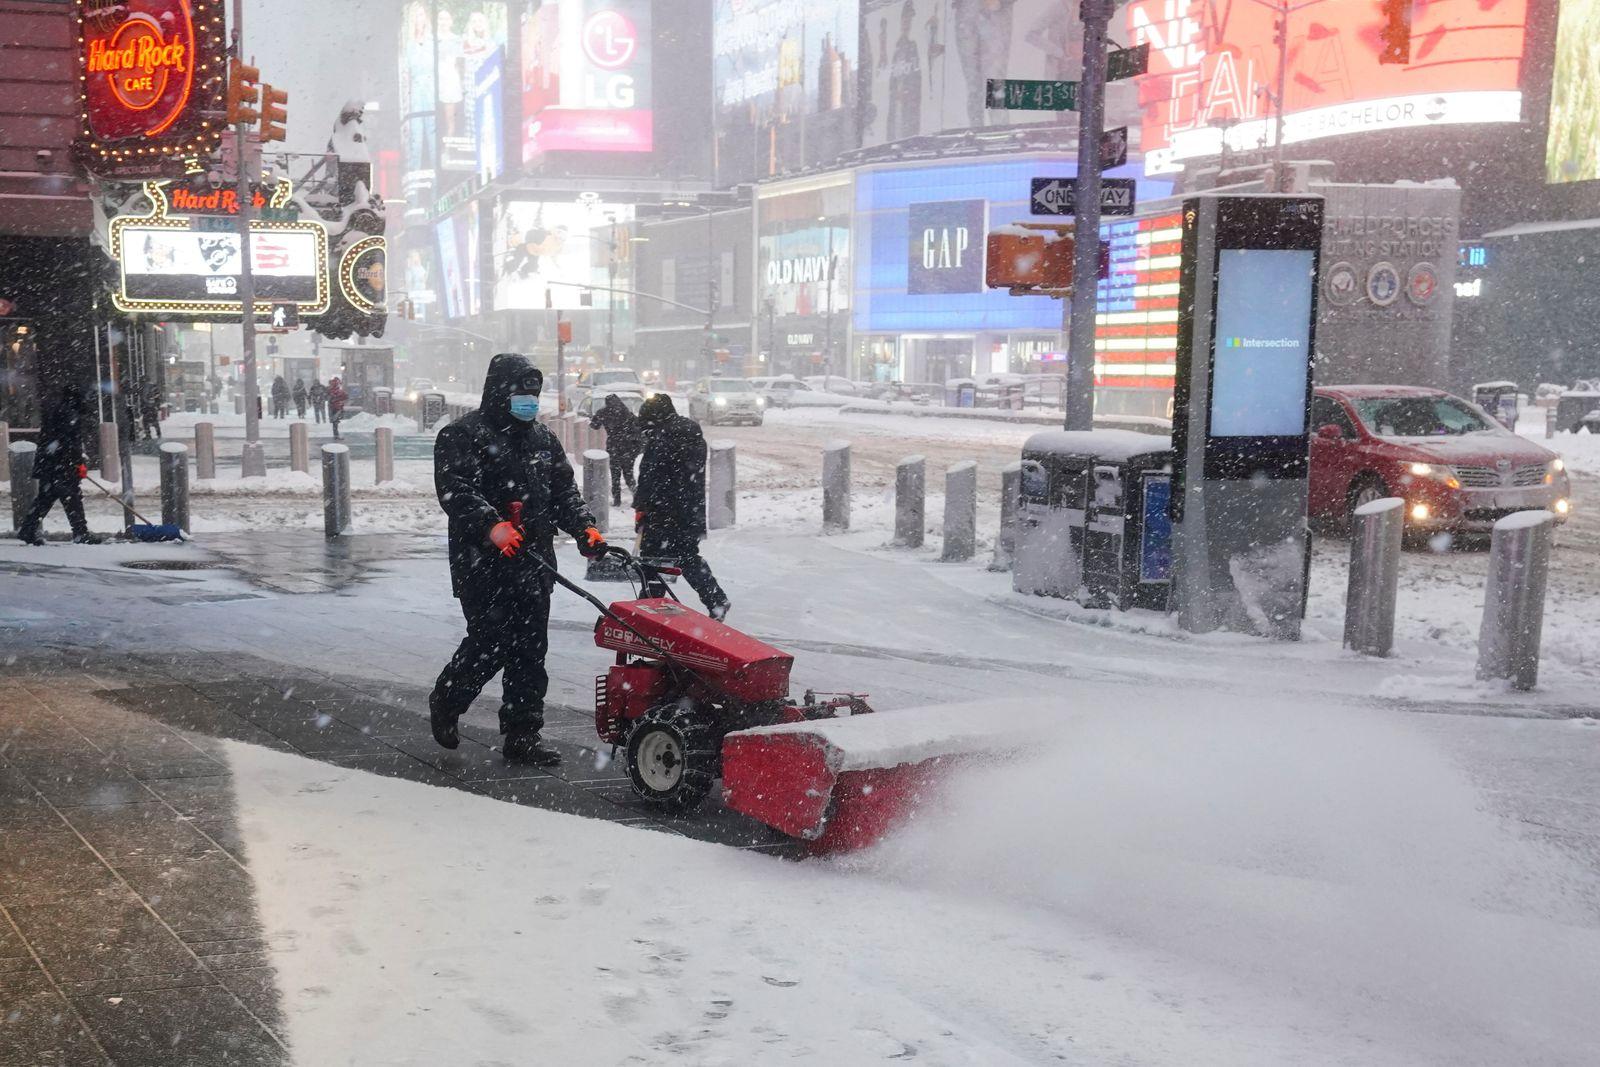 Snow storm in New York City